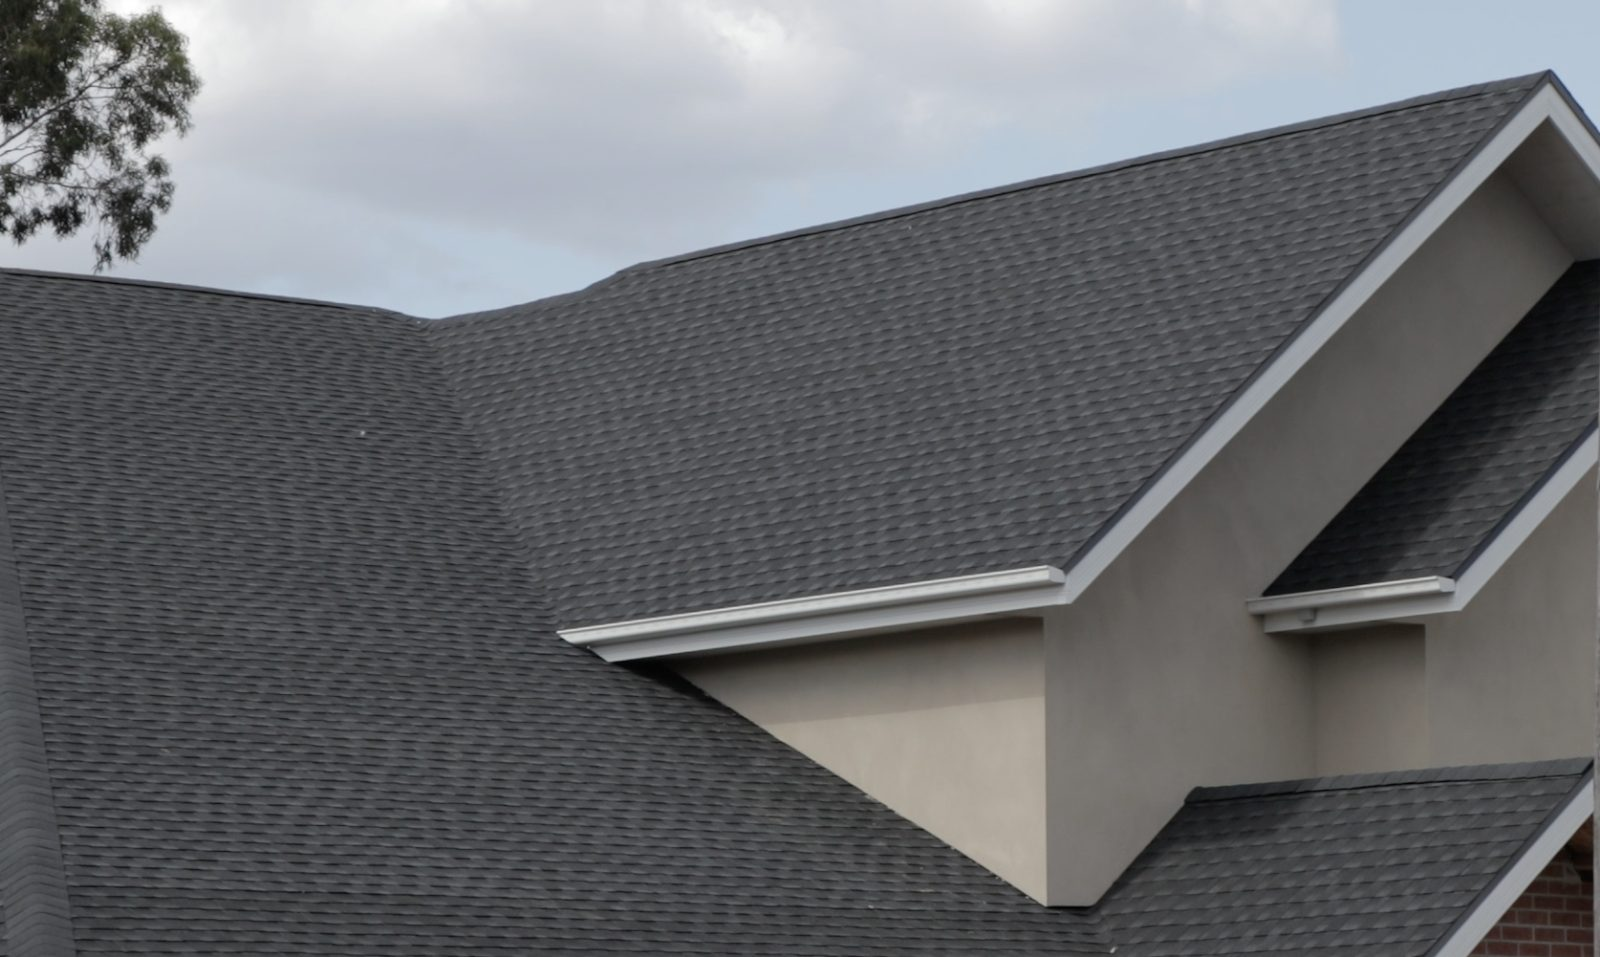 asphalt roof shingles Australia